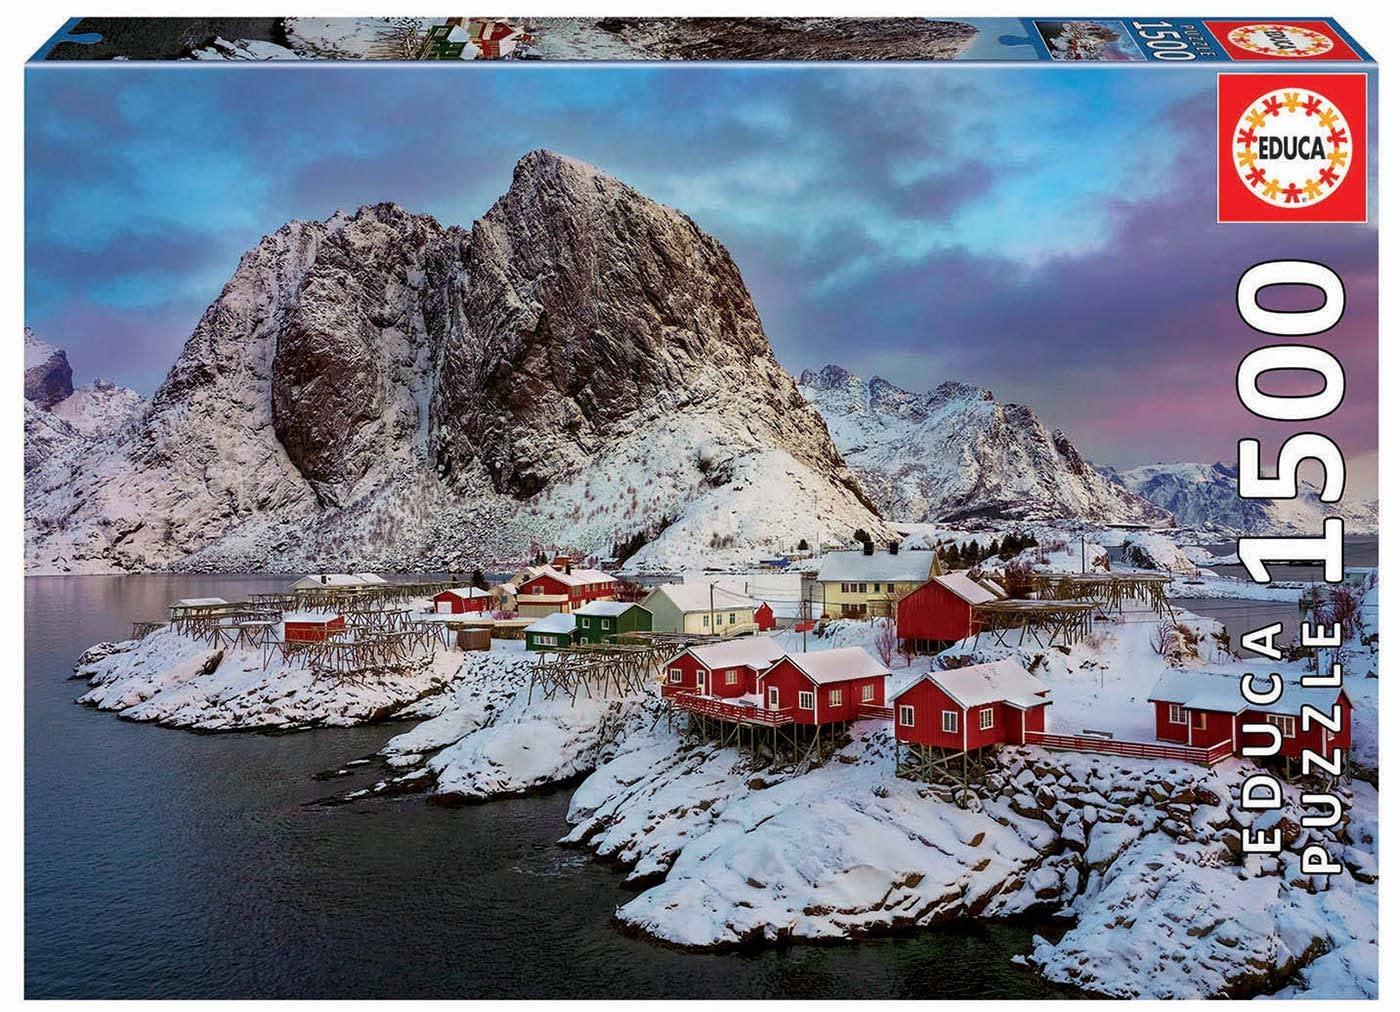 JOHN HANSEN COMPANY ED1500 LOFOTEN ISLANDS NORWAY